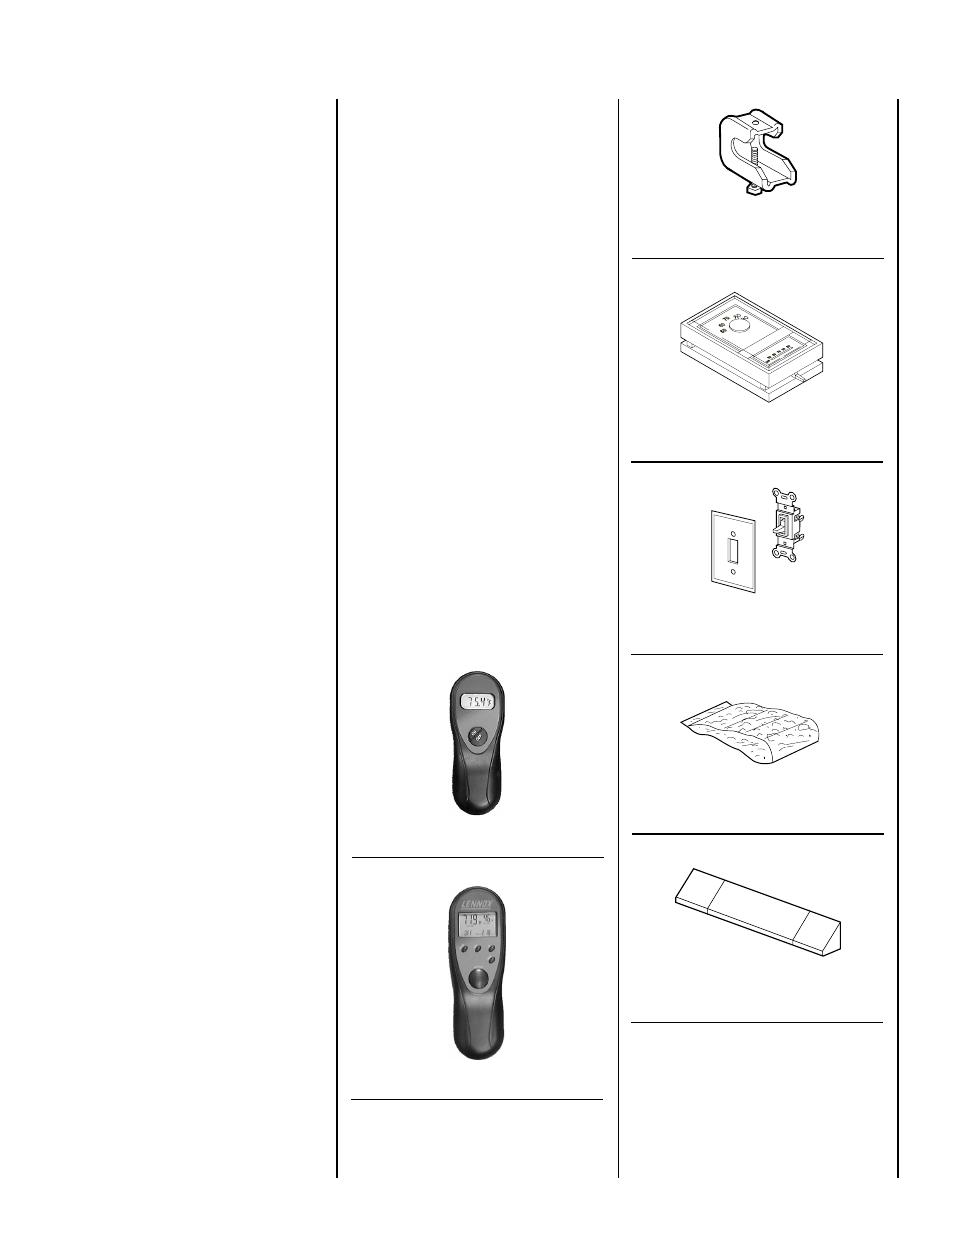 Superior Unvented Gas Log Room Heaters Vfgl 28vsp 4 Series User